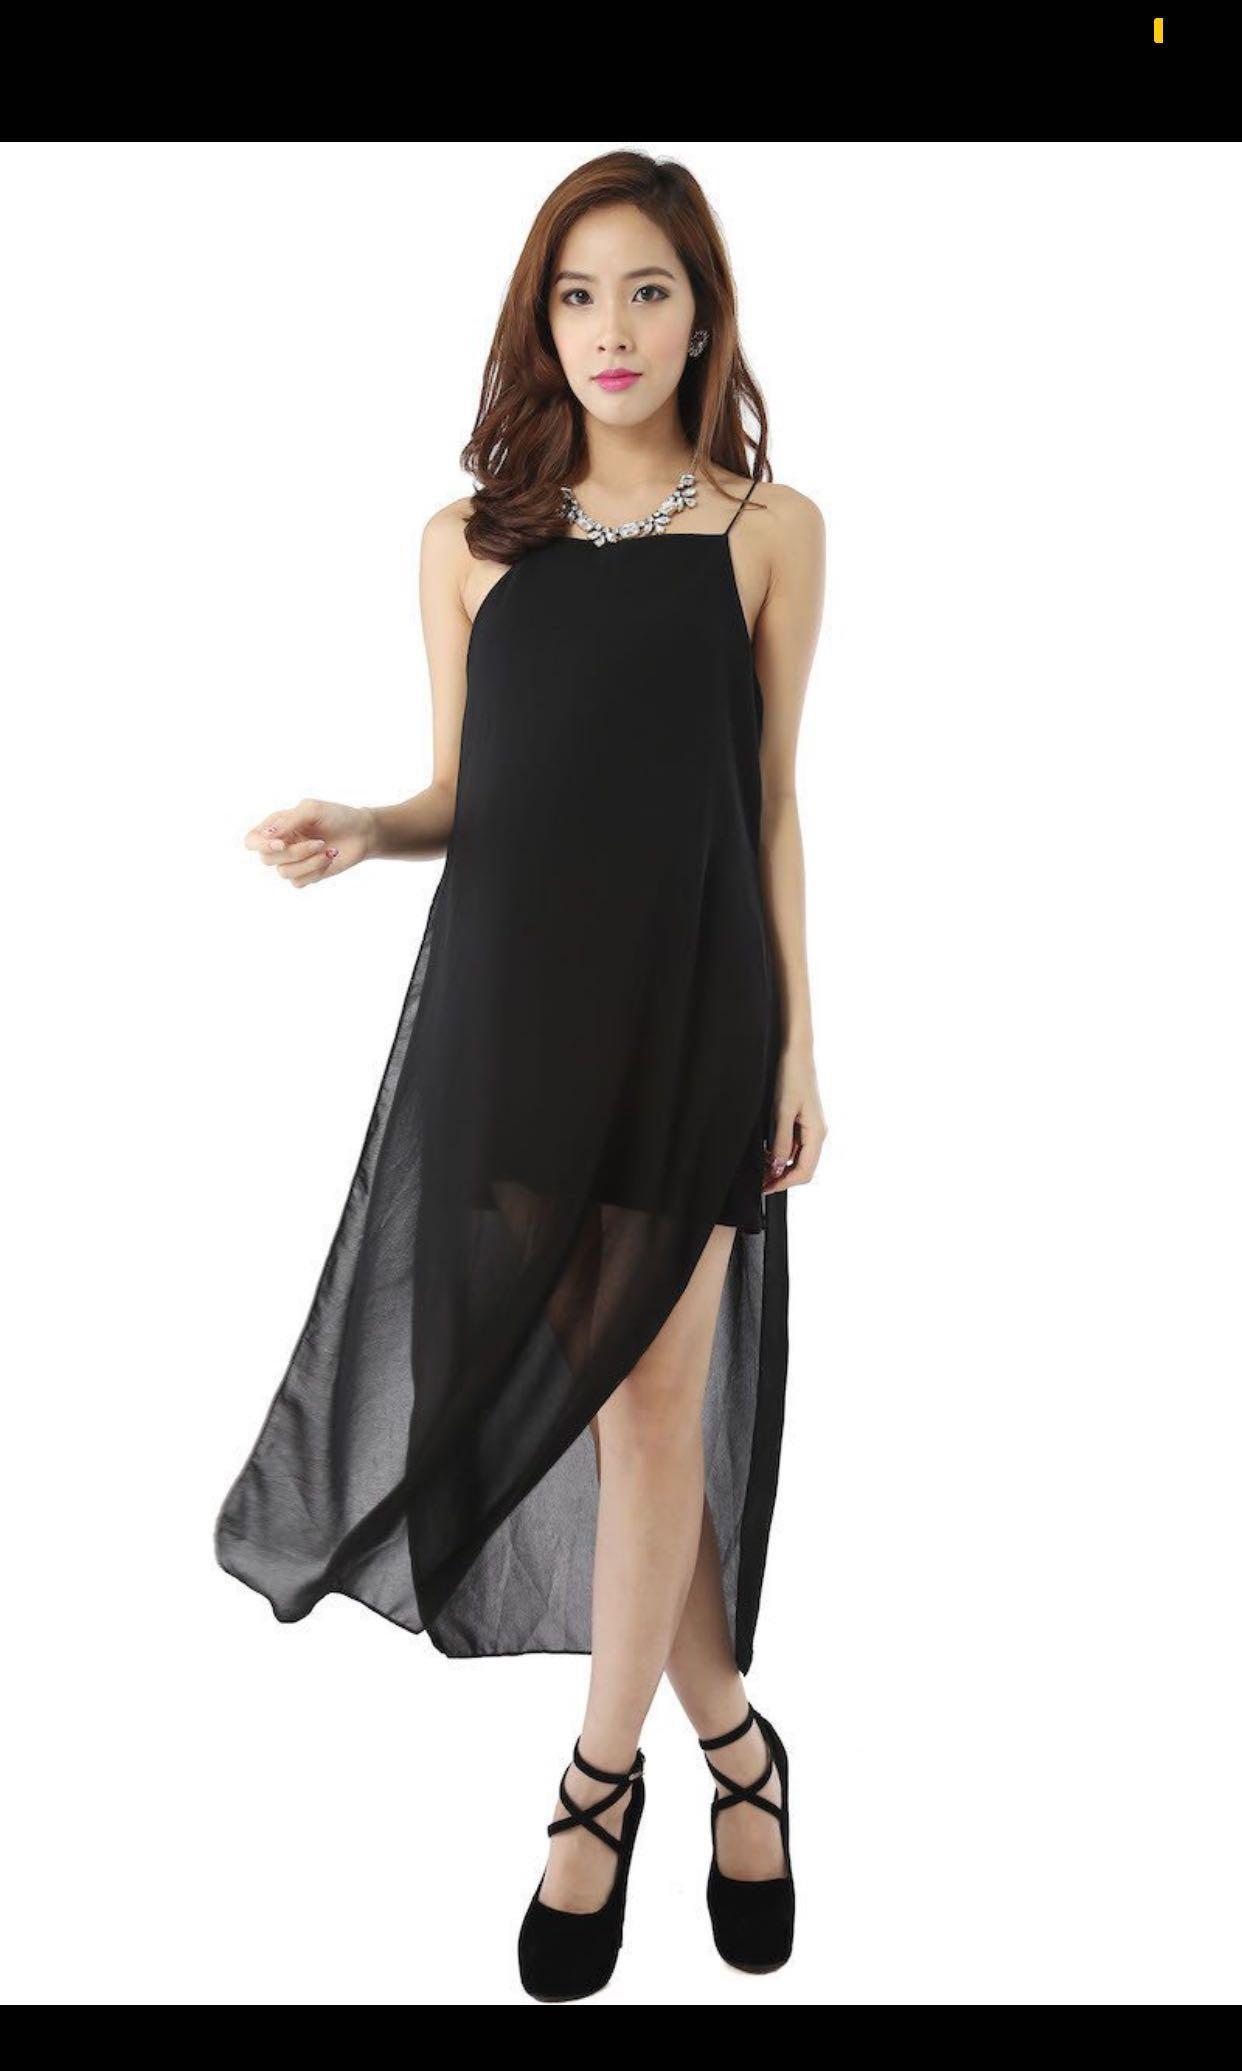 b332cb2dfb Carrislabelle Chiffon Maxi black dress, Women's Fashion, Clothes ...